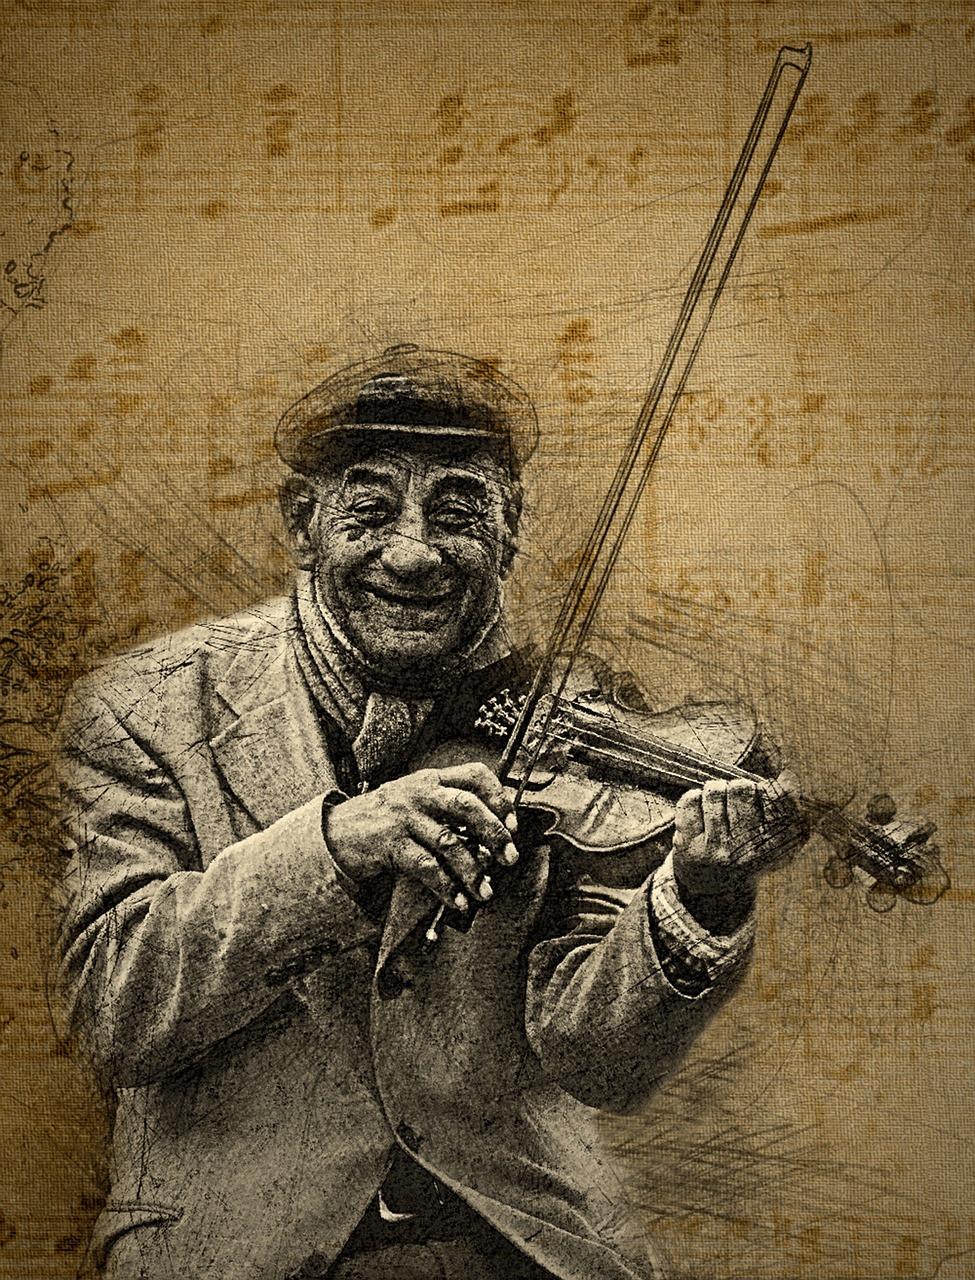 Old Man, Fiddle, Needpix